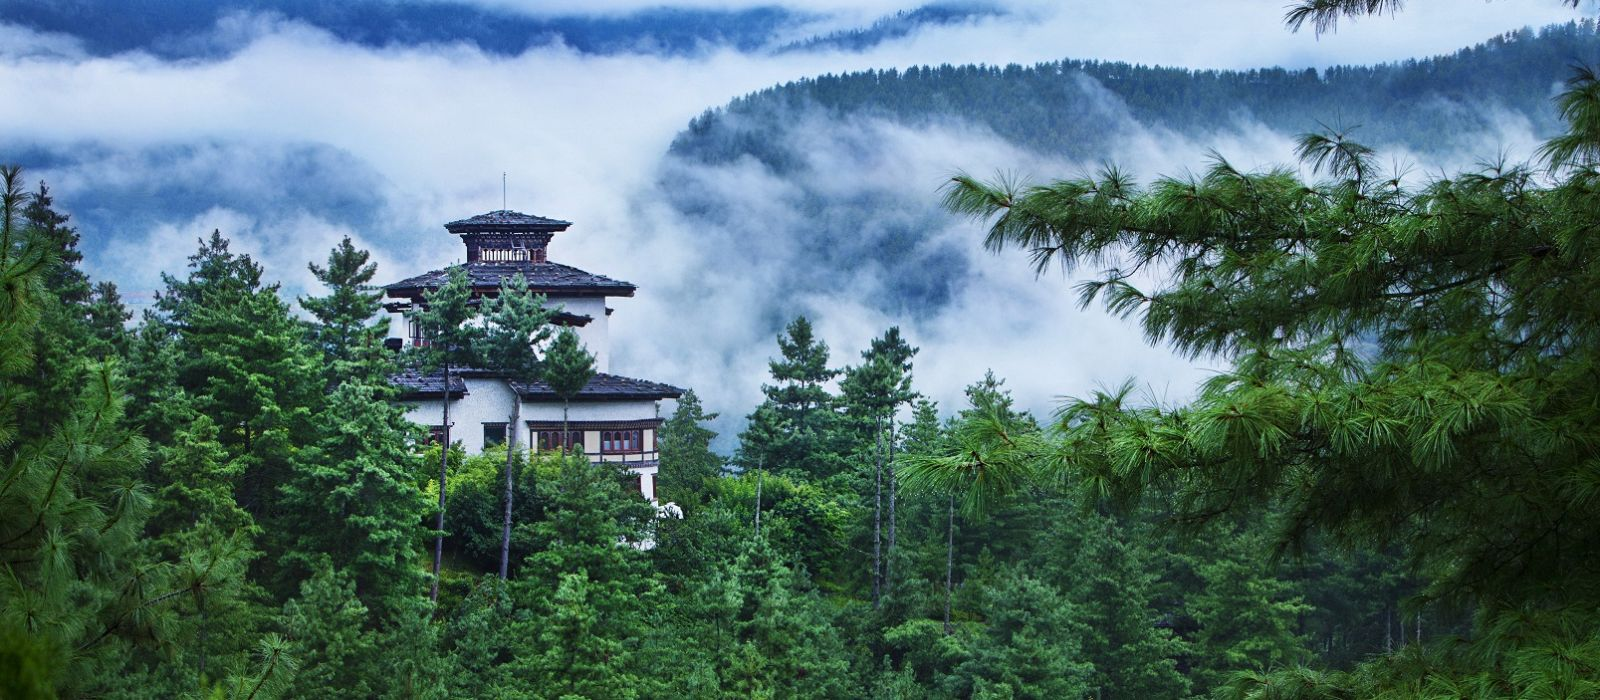 Exklusive Bhutan Luxusreise Urlaub 1